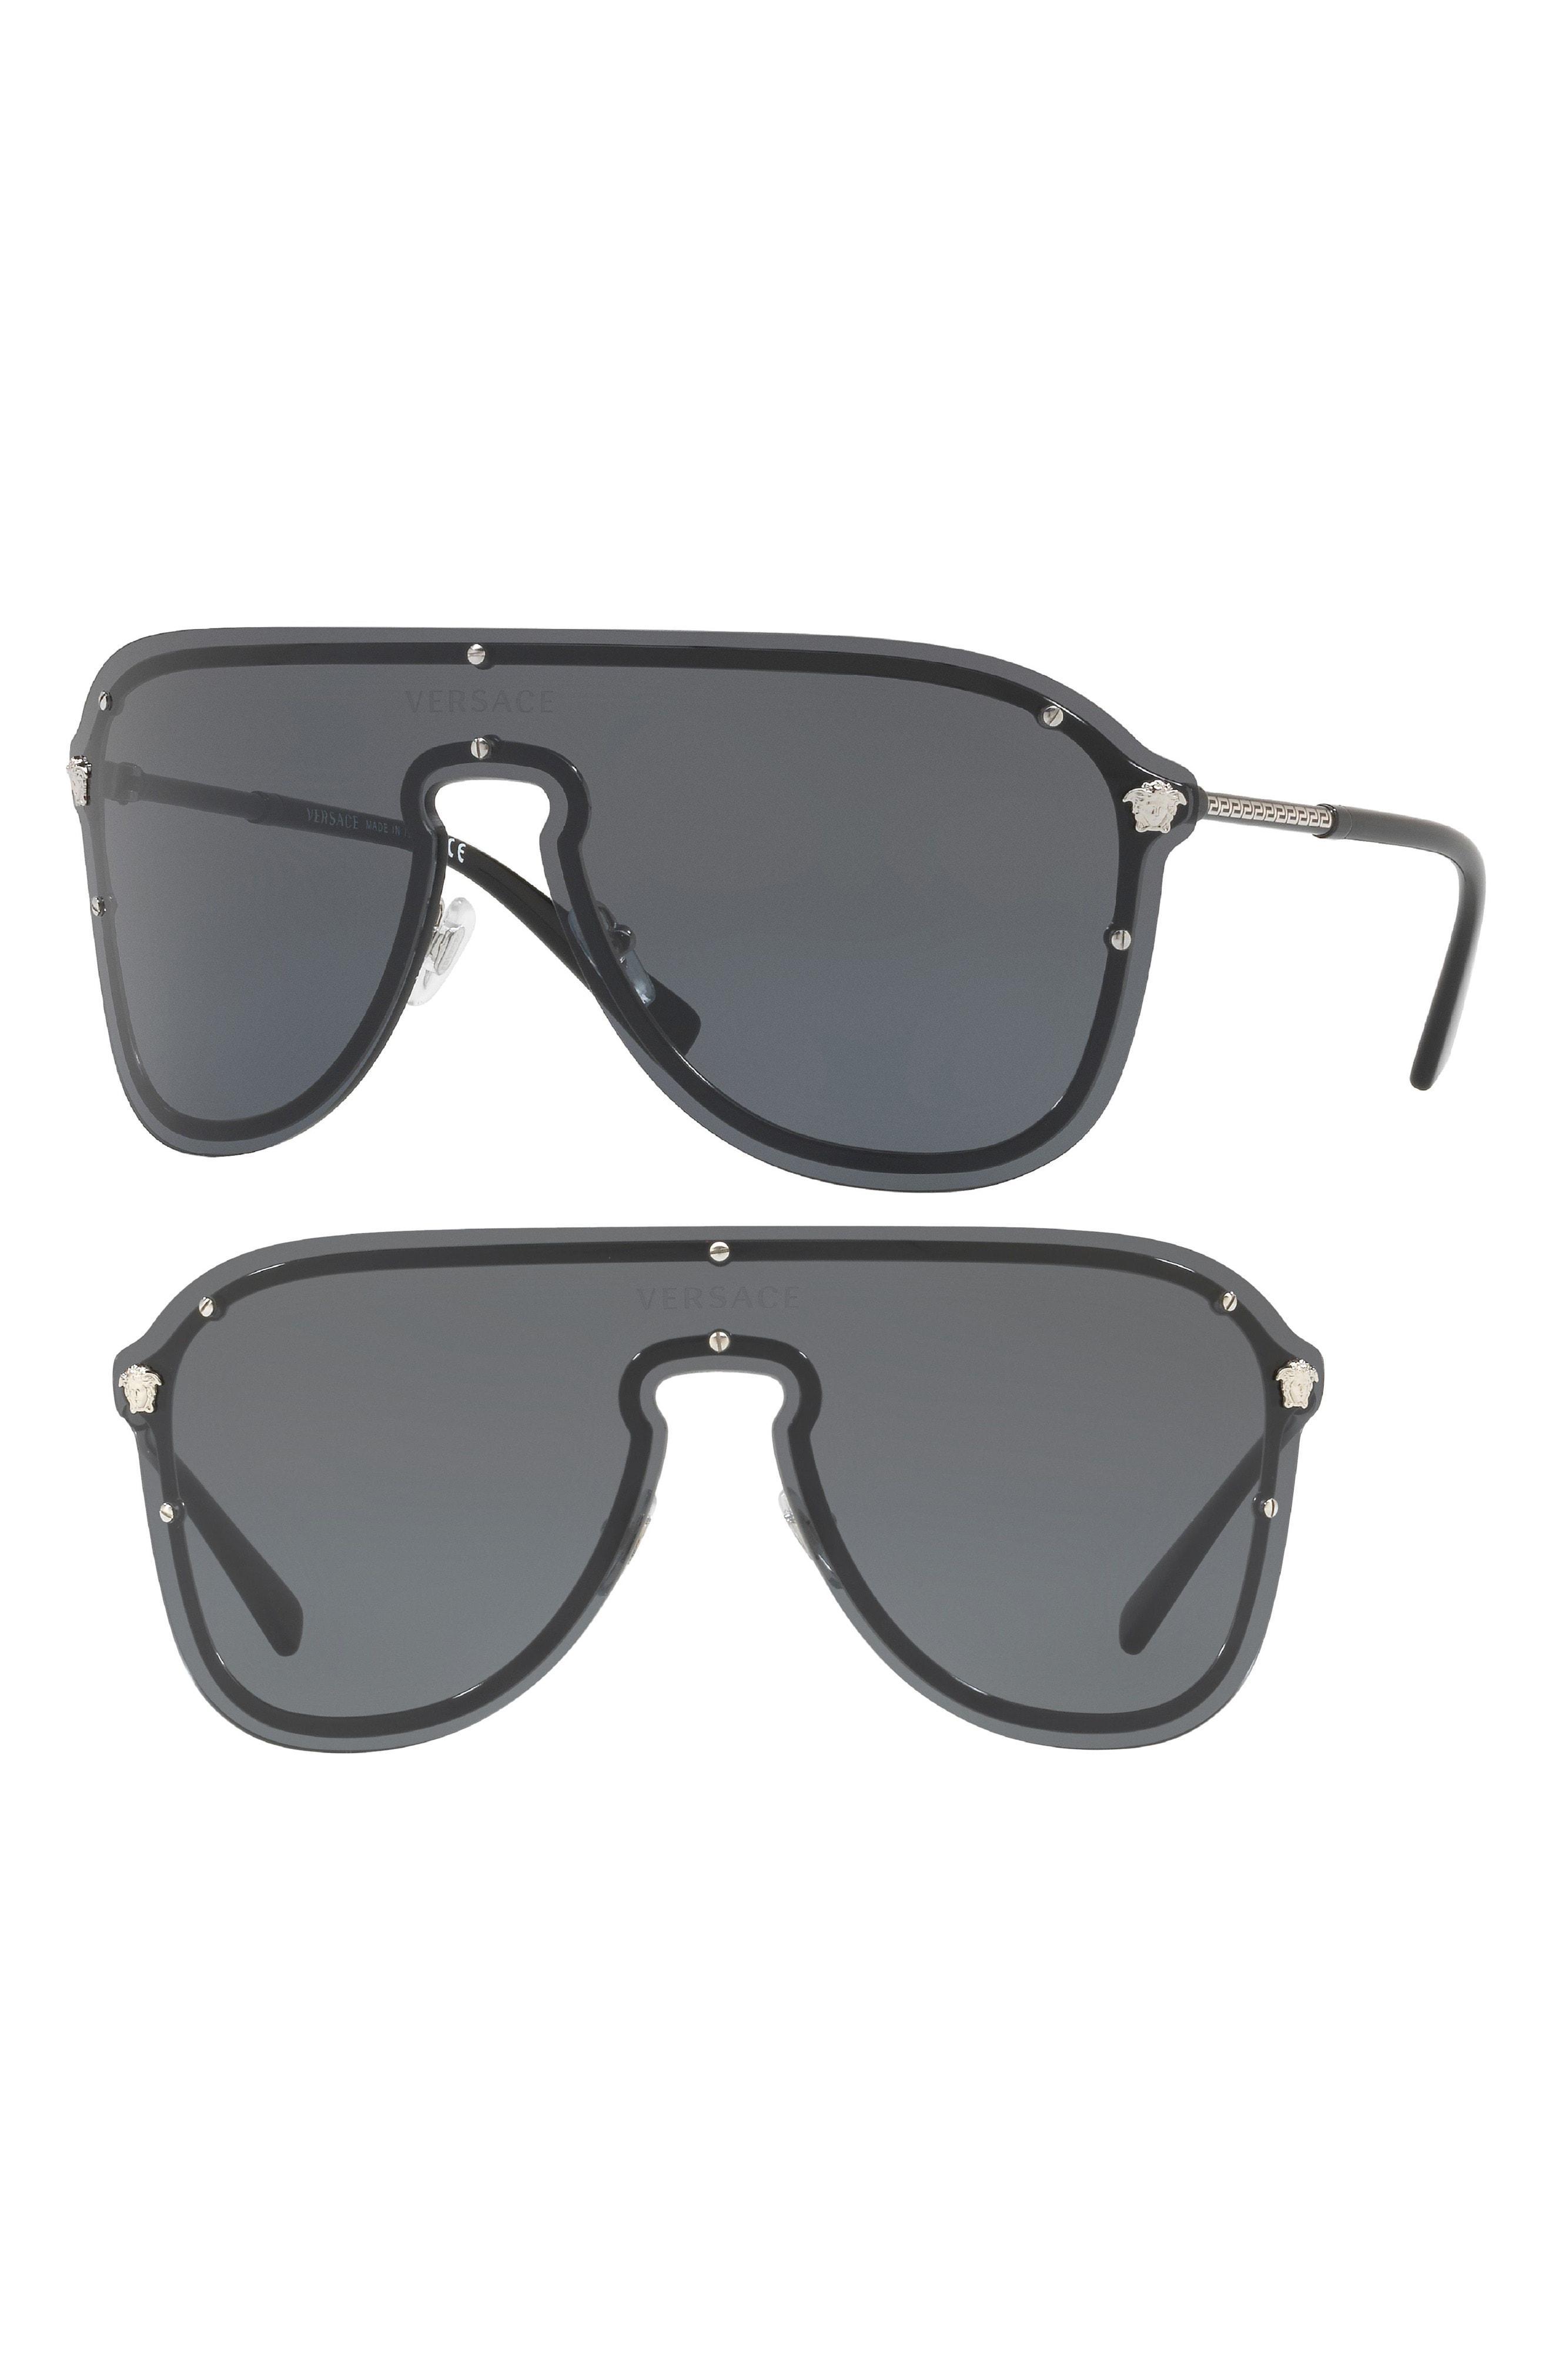 cc0baa7072b64 Lyst - Versace 144mm Shield Sunglasses - in Gray